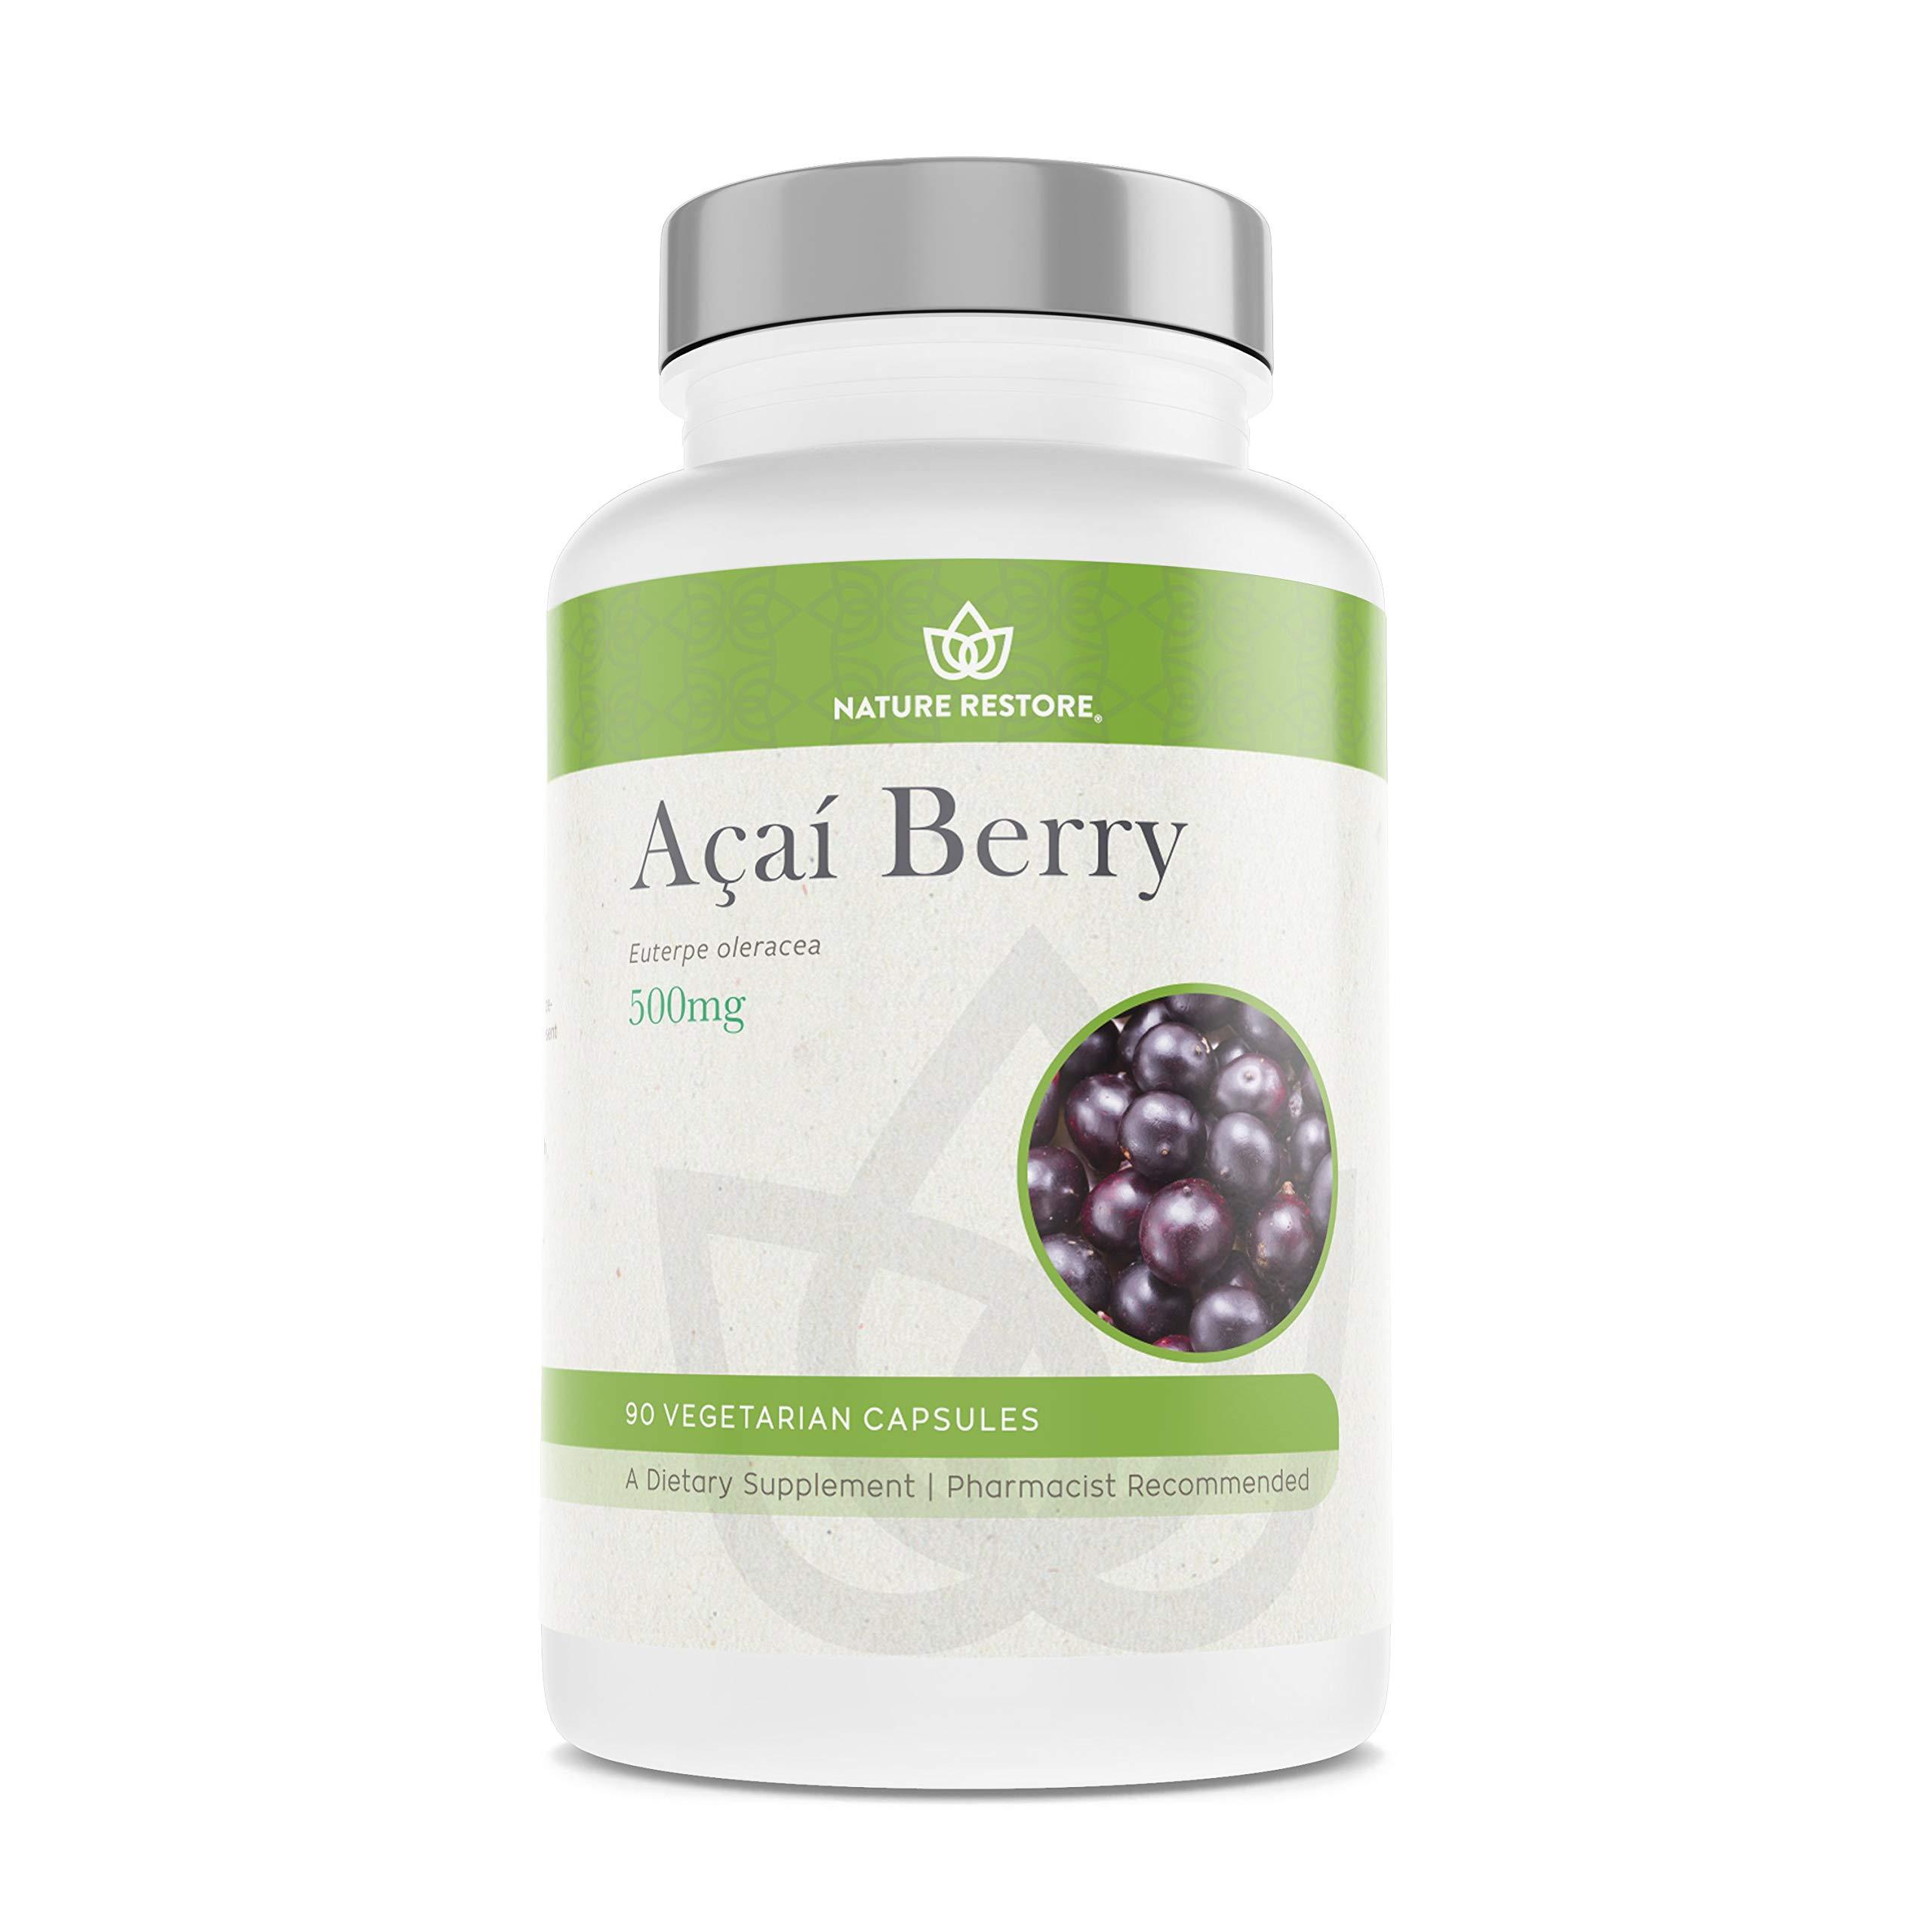 Organic Acai Berry Supplement, Freeze Dried, 90 Acai Berry Capsules, Non GMO, Gluten Free, Vegan by Nature Restore